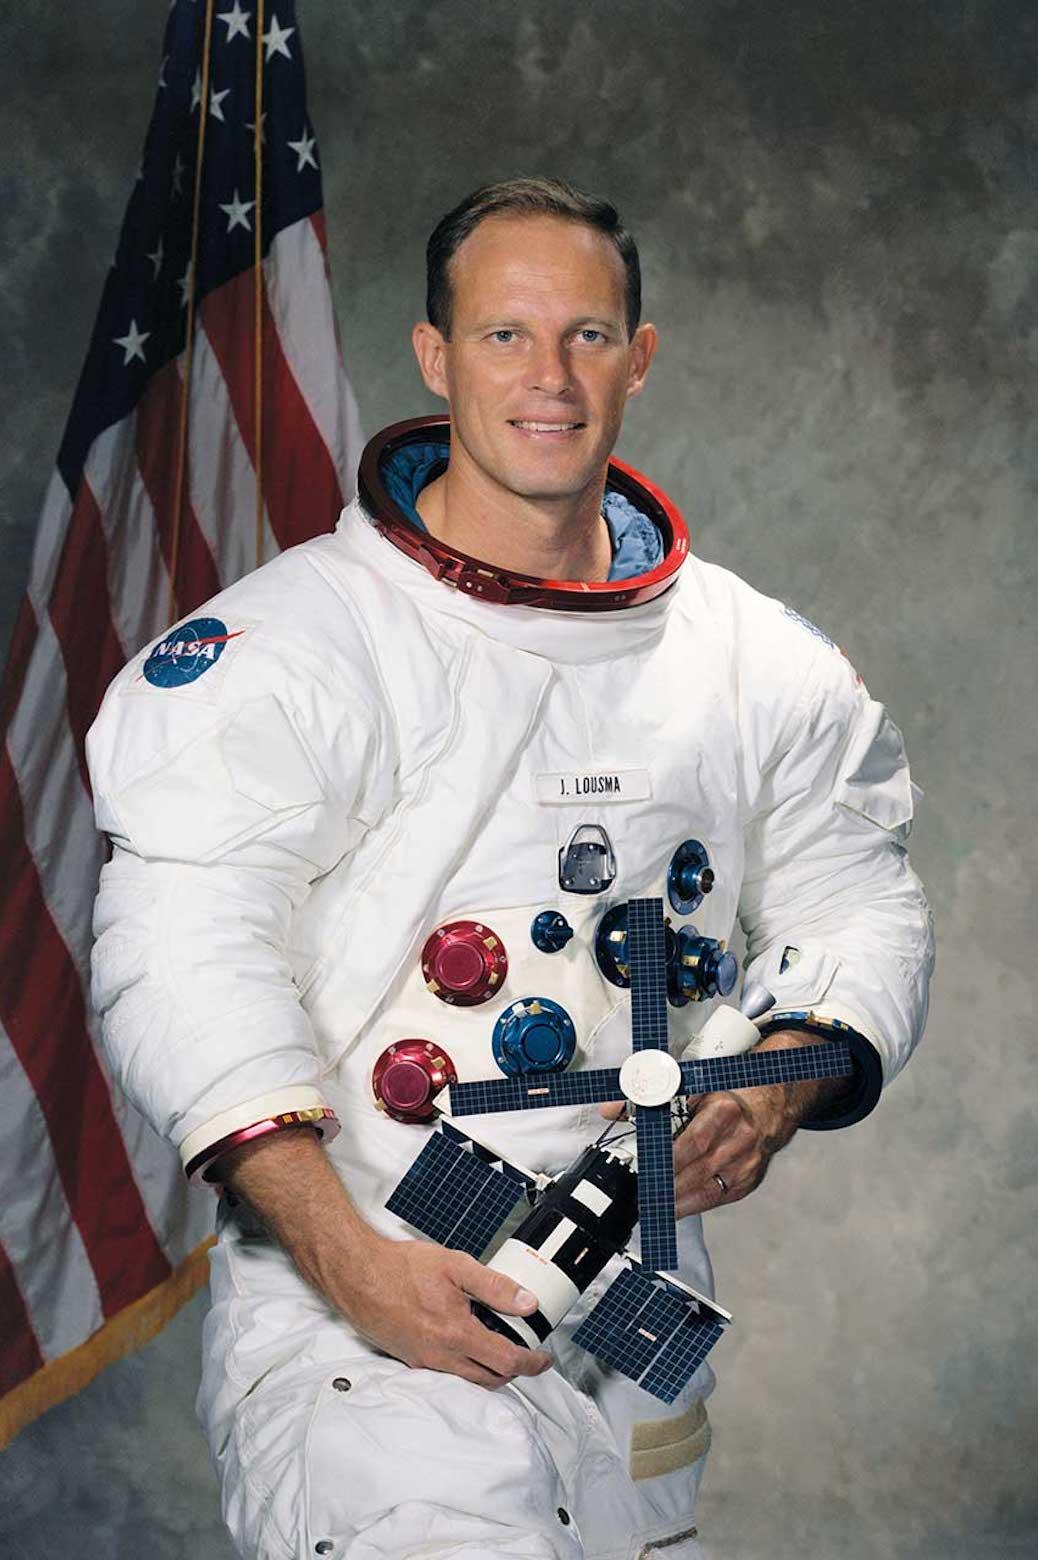 Portrait of Jack Lousma in his astronaut gear